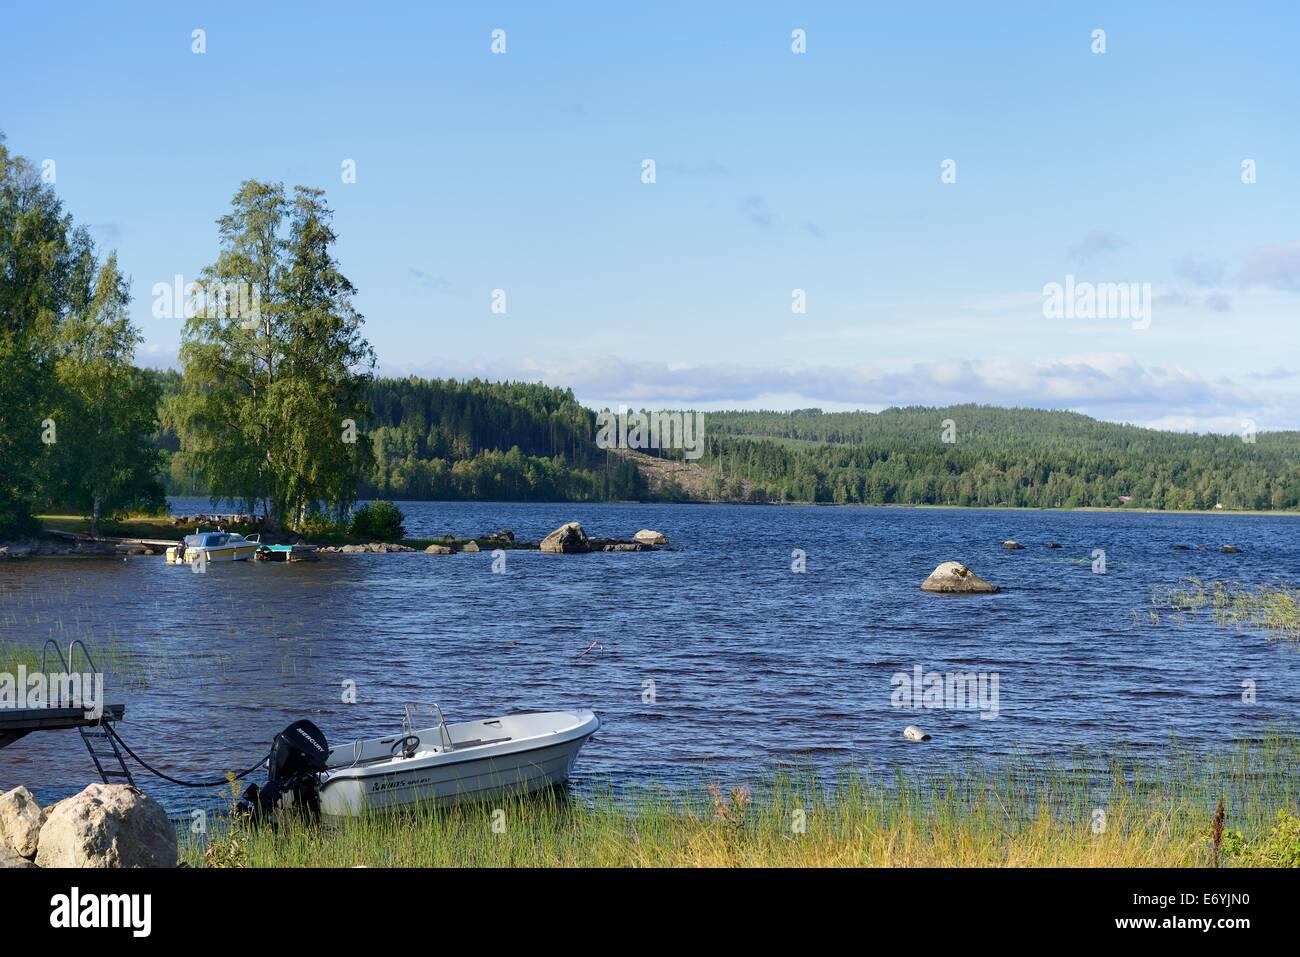 A beautiful lake in Sweden along the Hoga Kusten - Stock Image